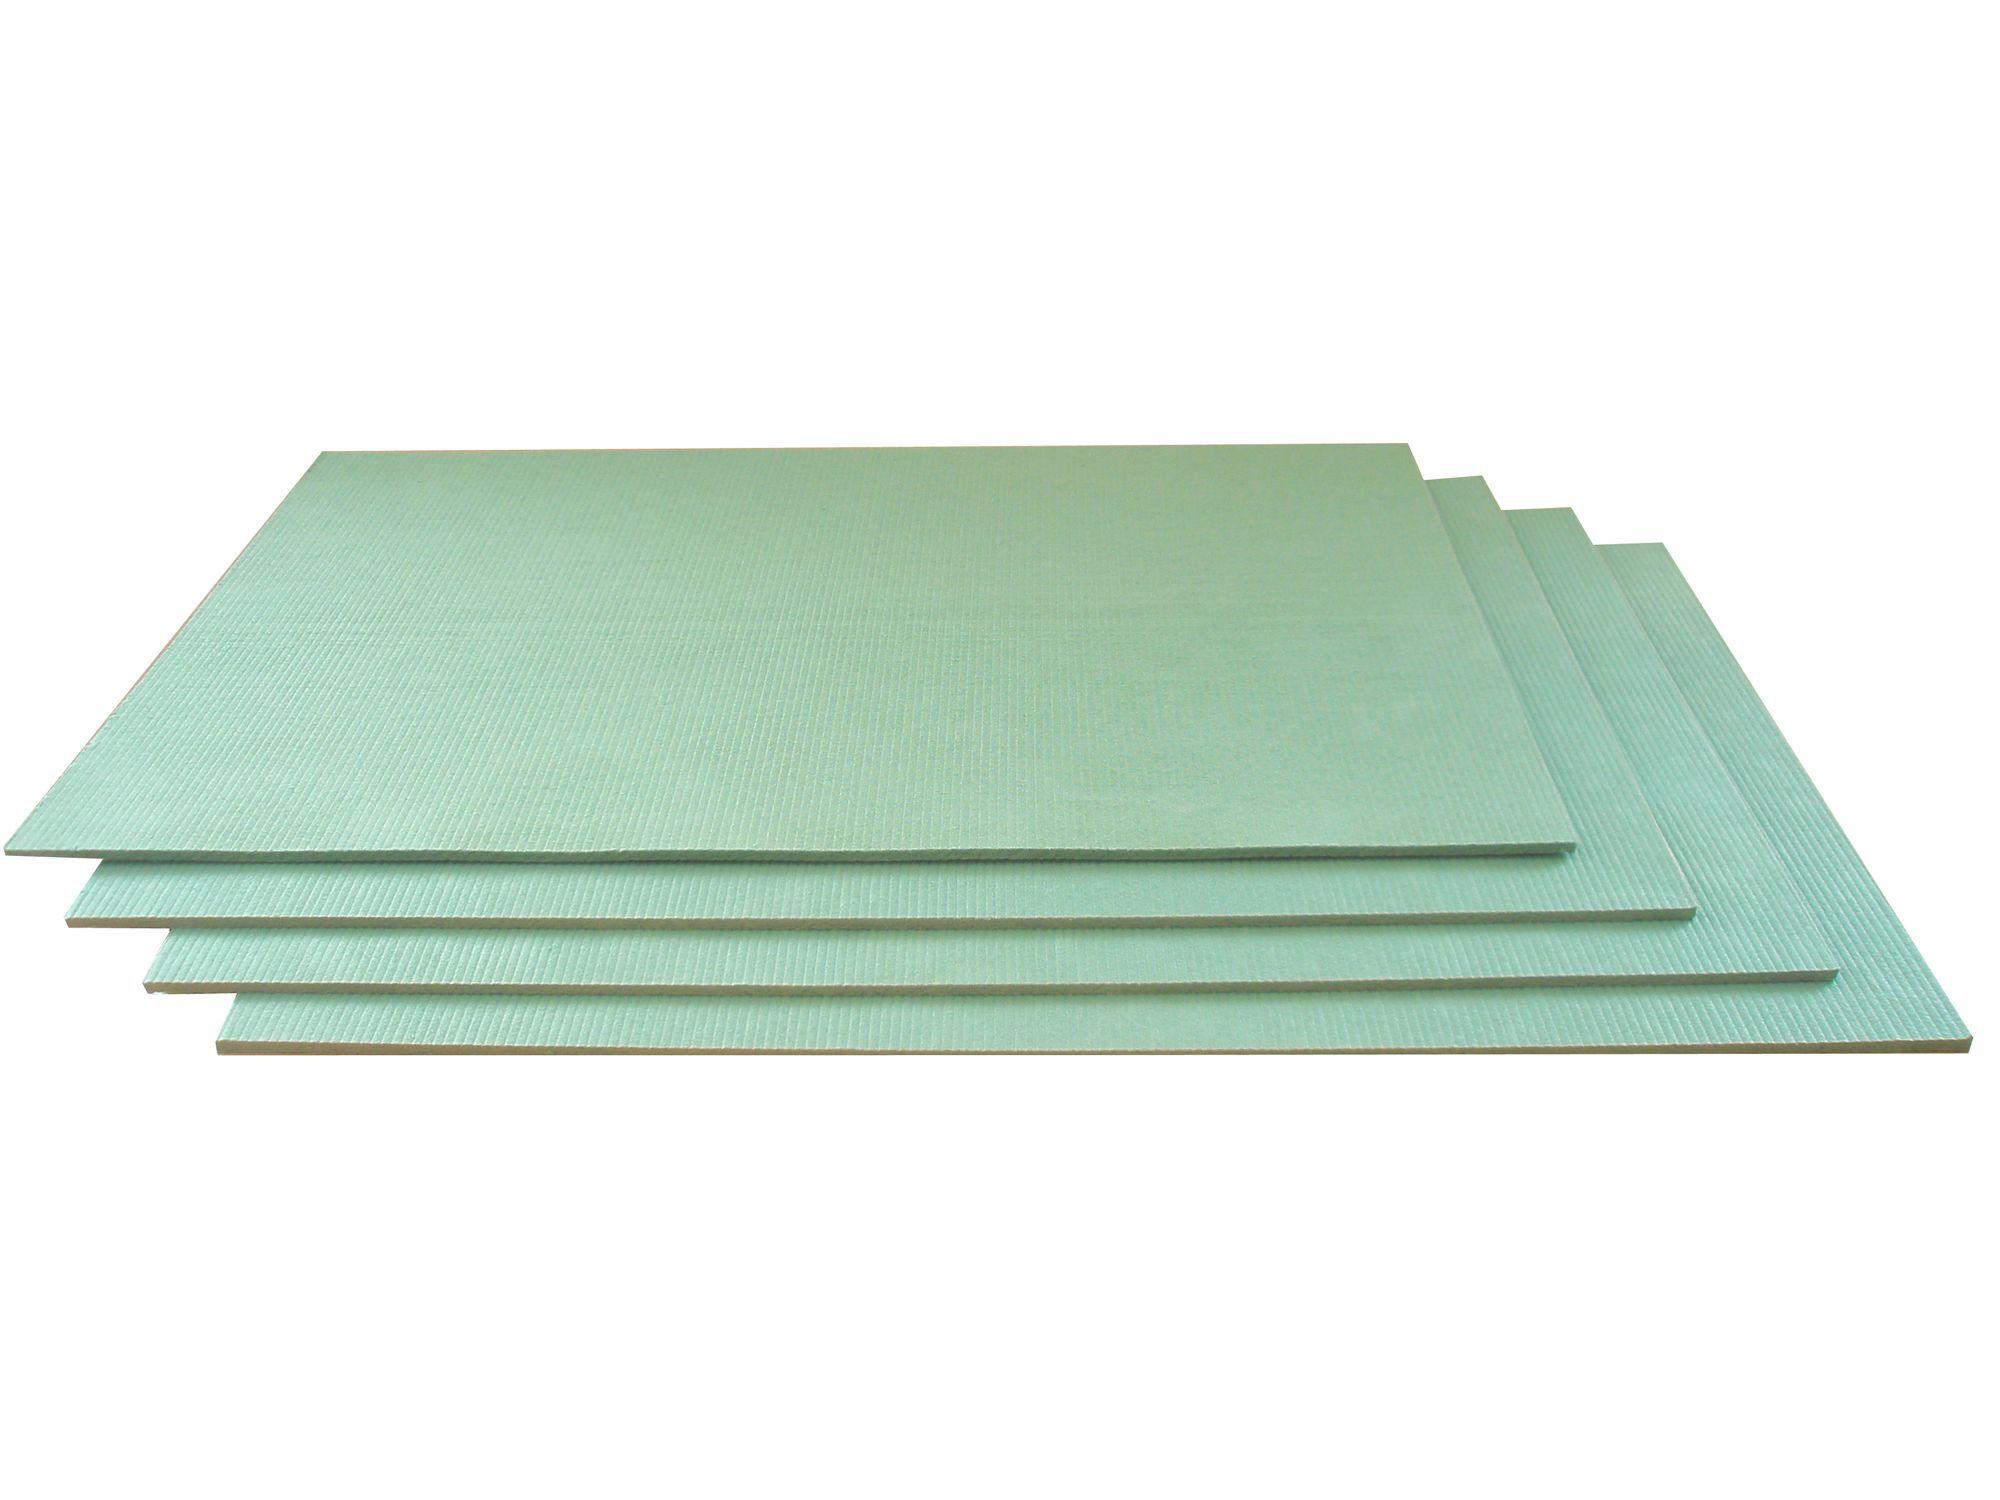 Diall 6mm Fibreboard Laminate Flooring u0026 Glueless Wood Flooring Underlay 9.6 mu00b2 : Departments ...